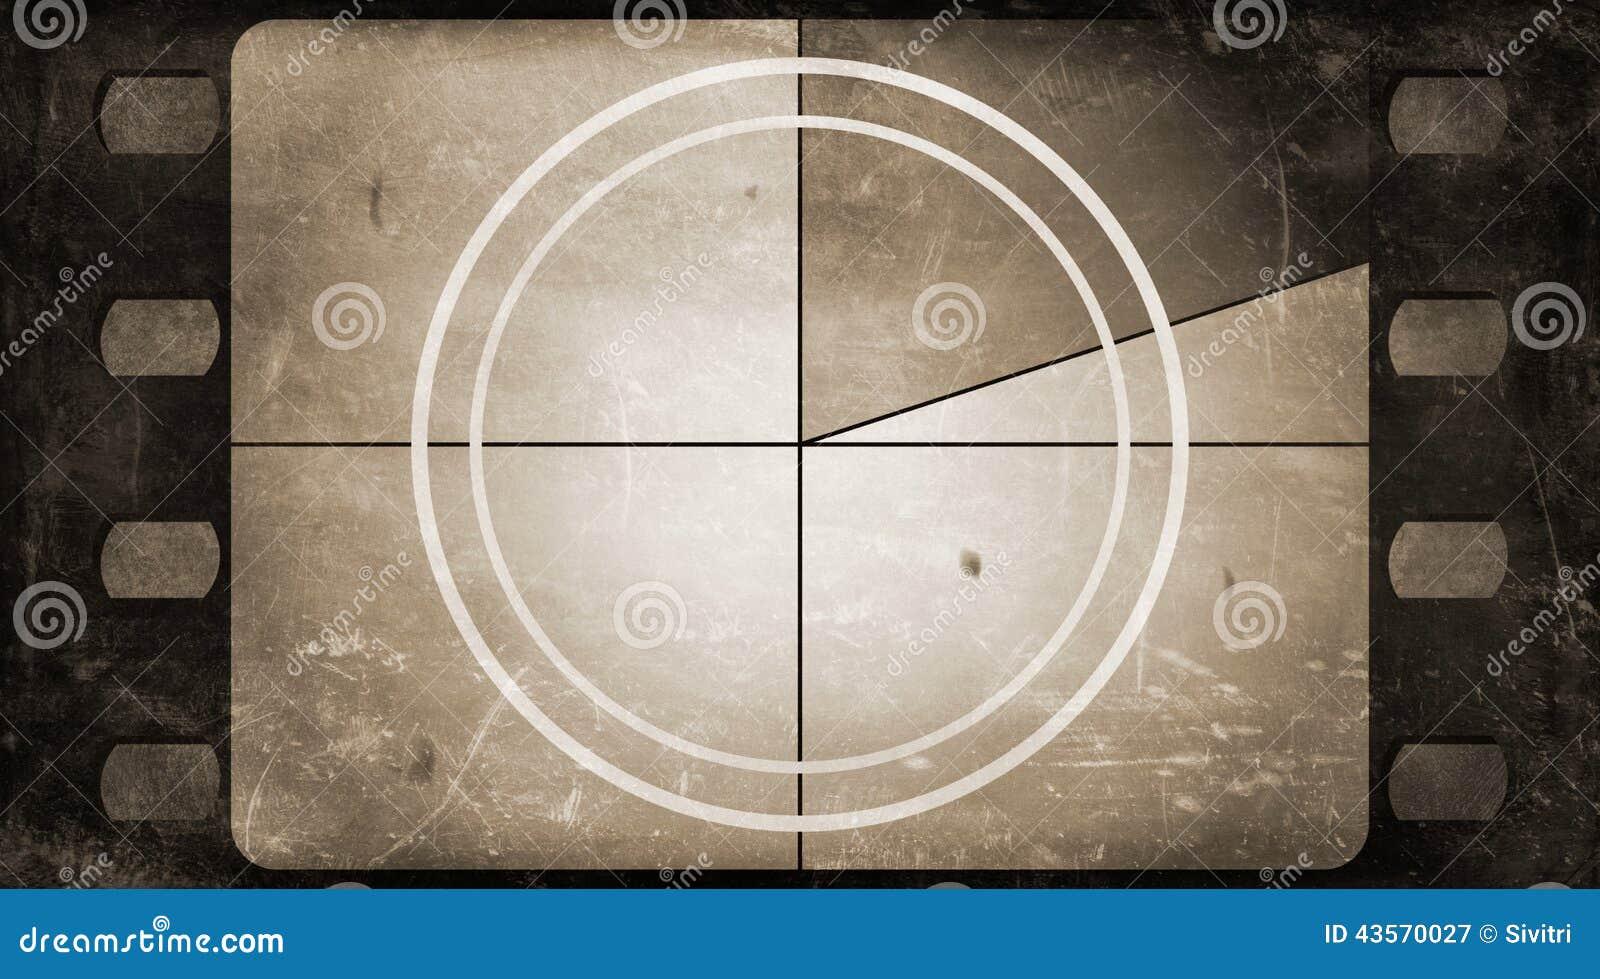 Grunge Camera Vector : Grunge film frame background with vintage movie countdown stock